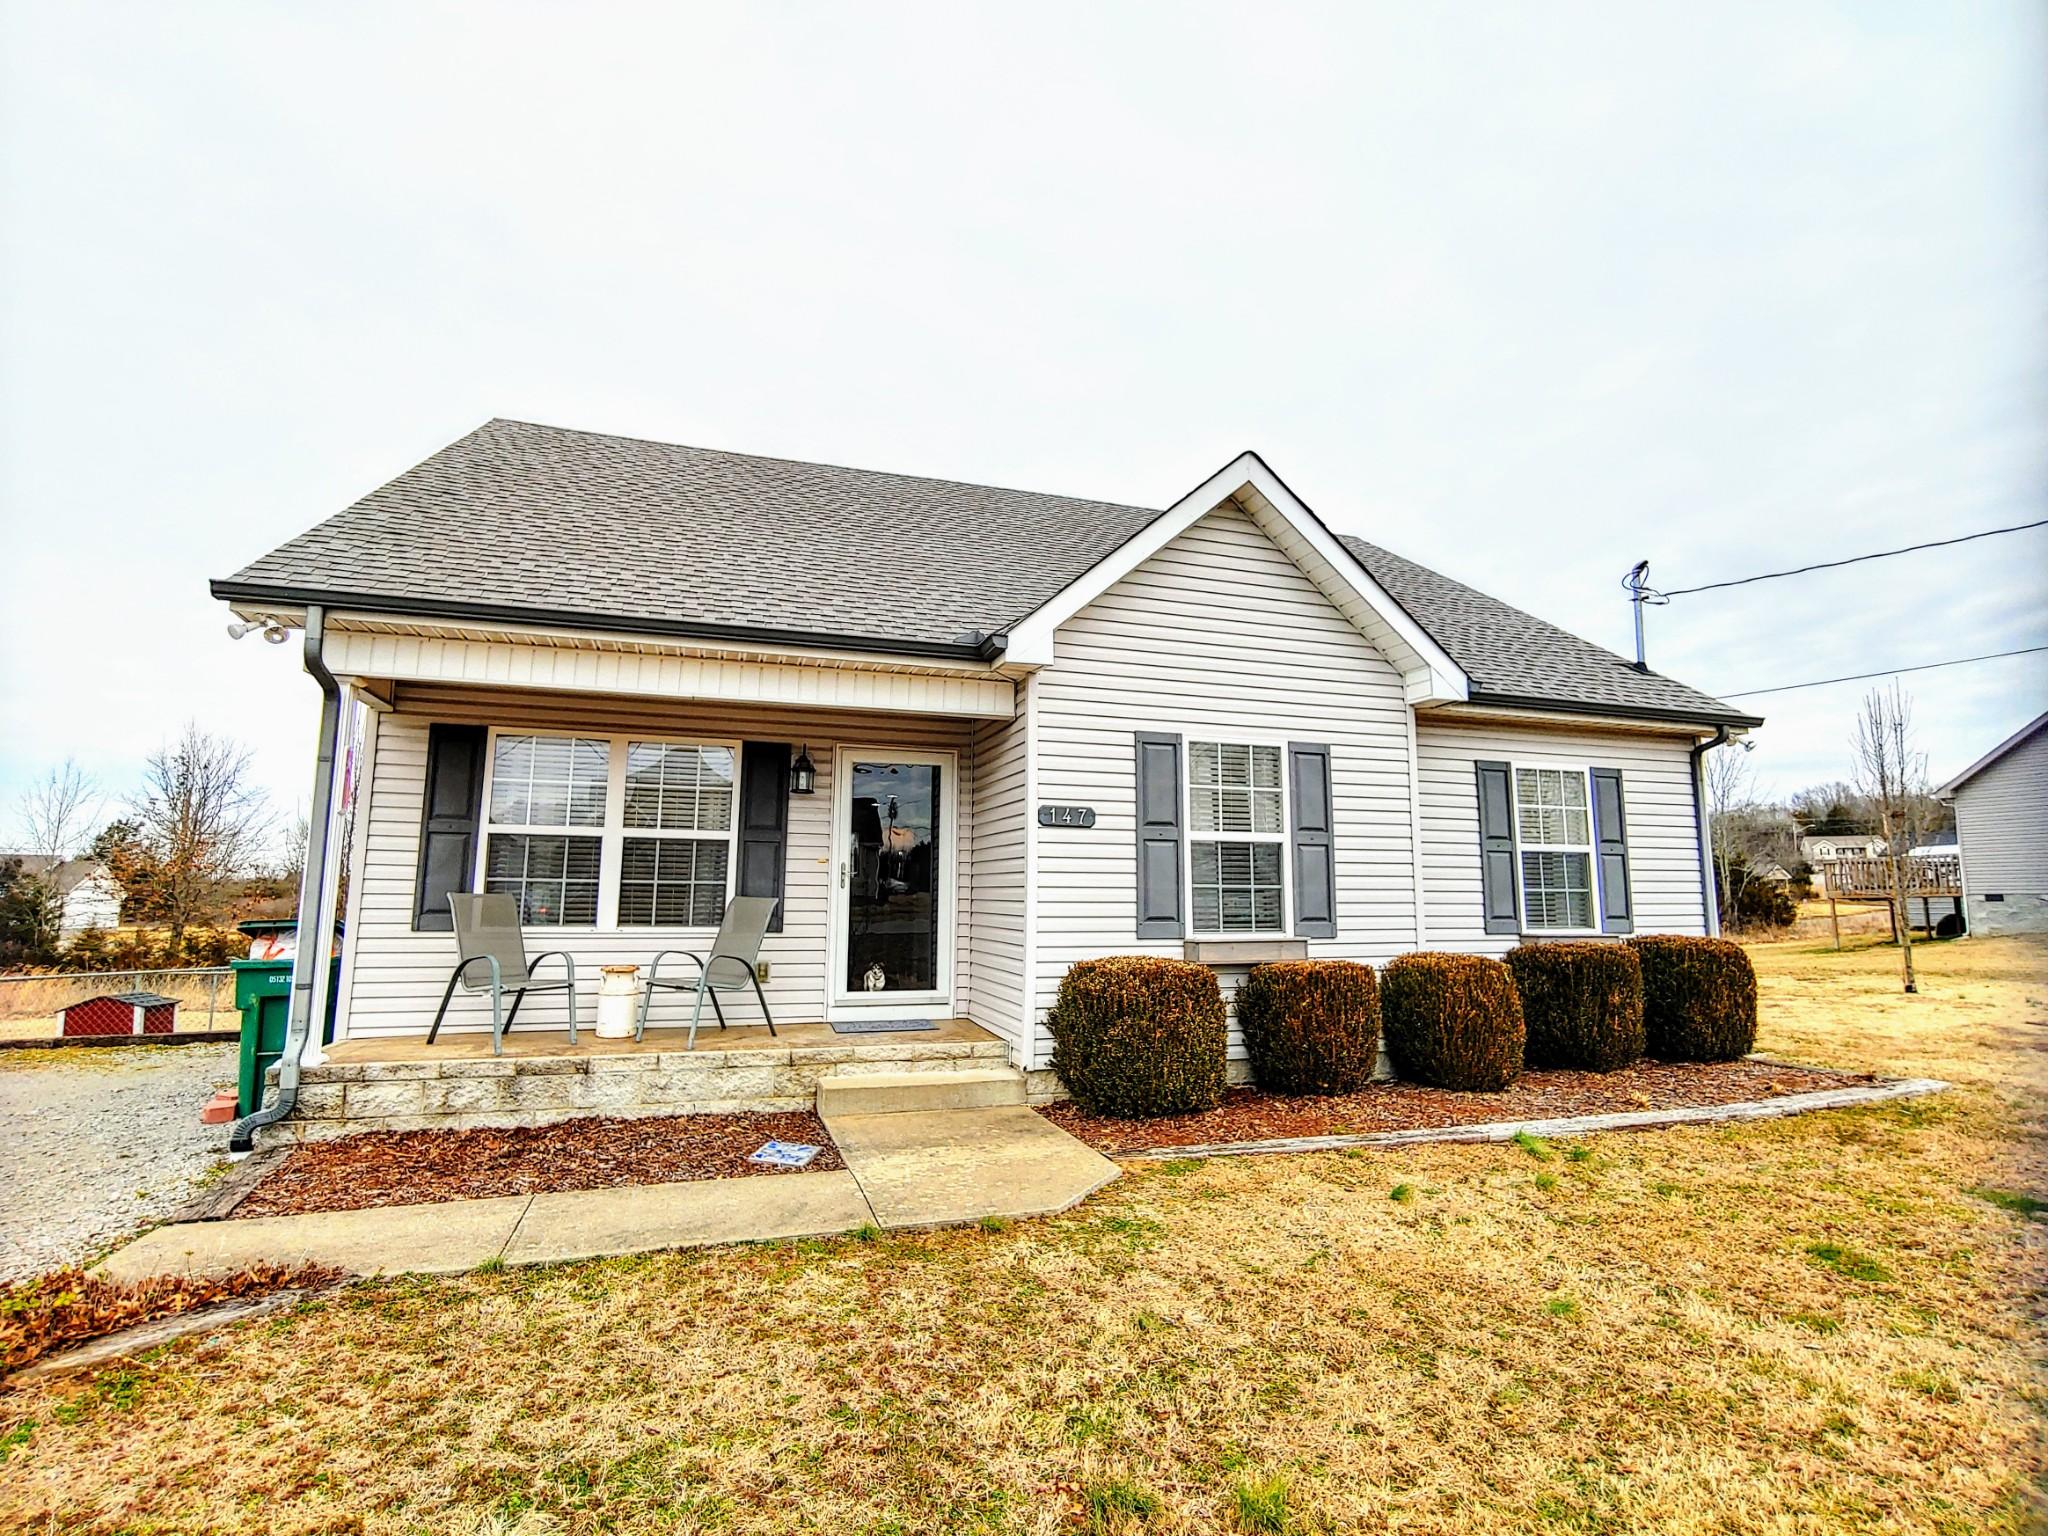 147 Landon Ln Property Photo - Lewisburg, TN real estate listing